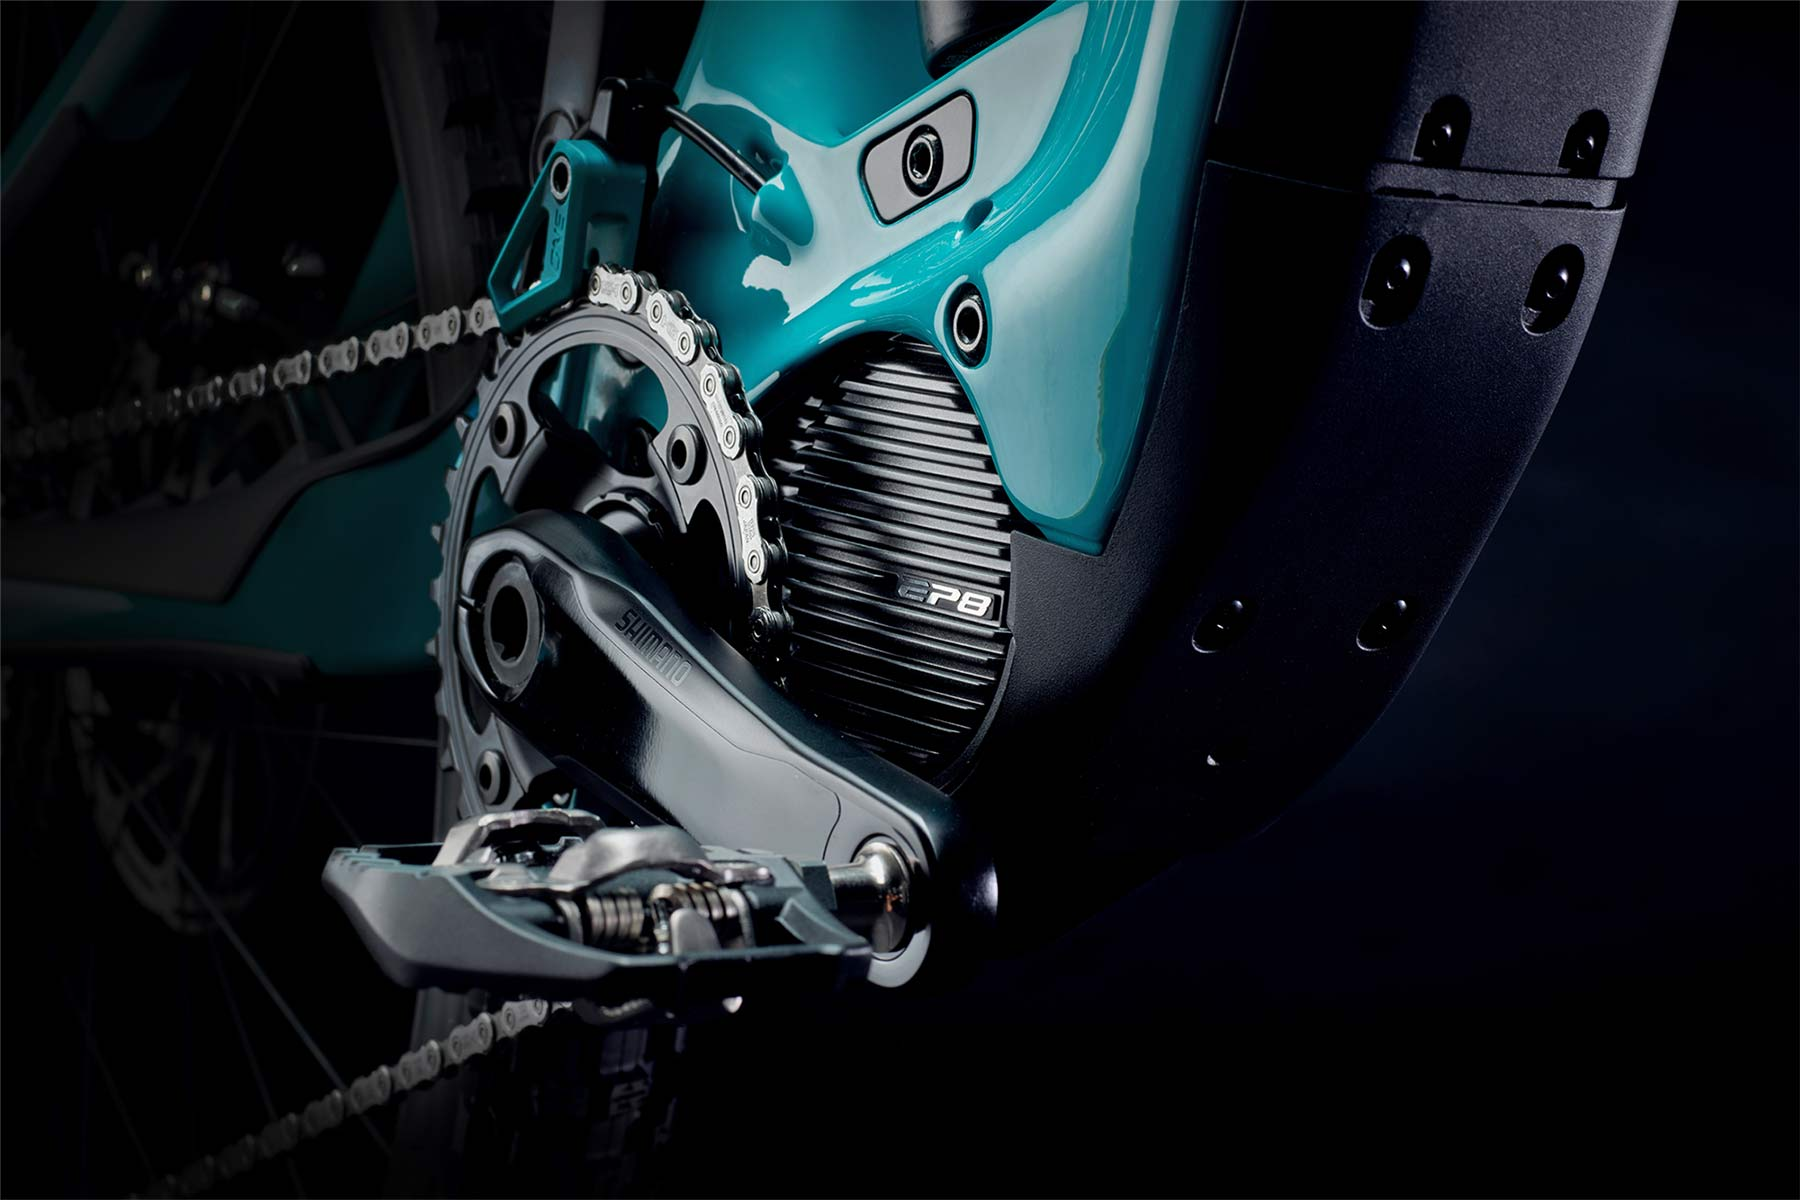 Yeti 160E EWS racing e-bike, all-new 6-bar suspension carbon 160mm eMTB,Shimano EP8